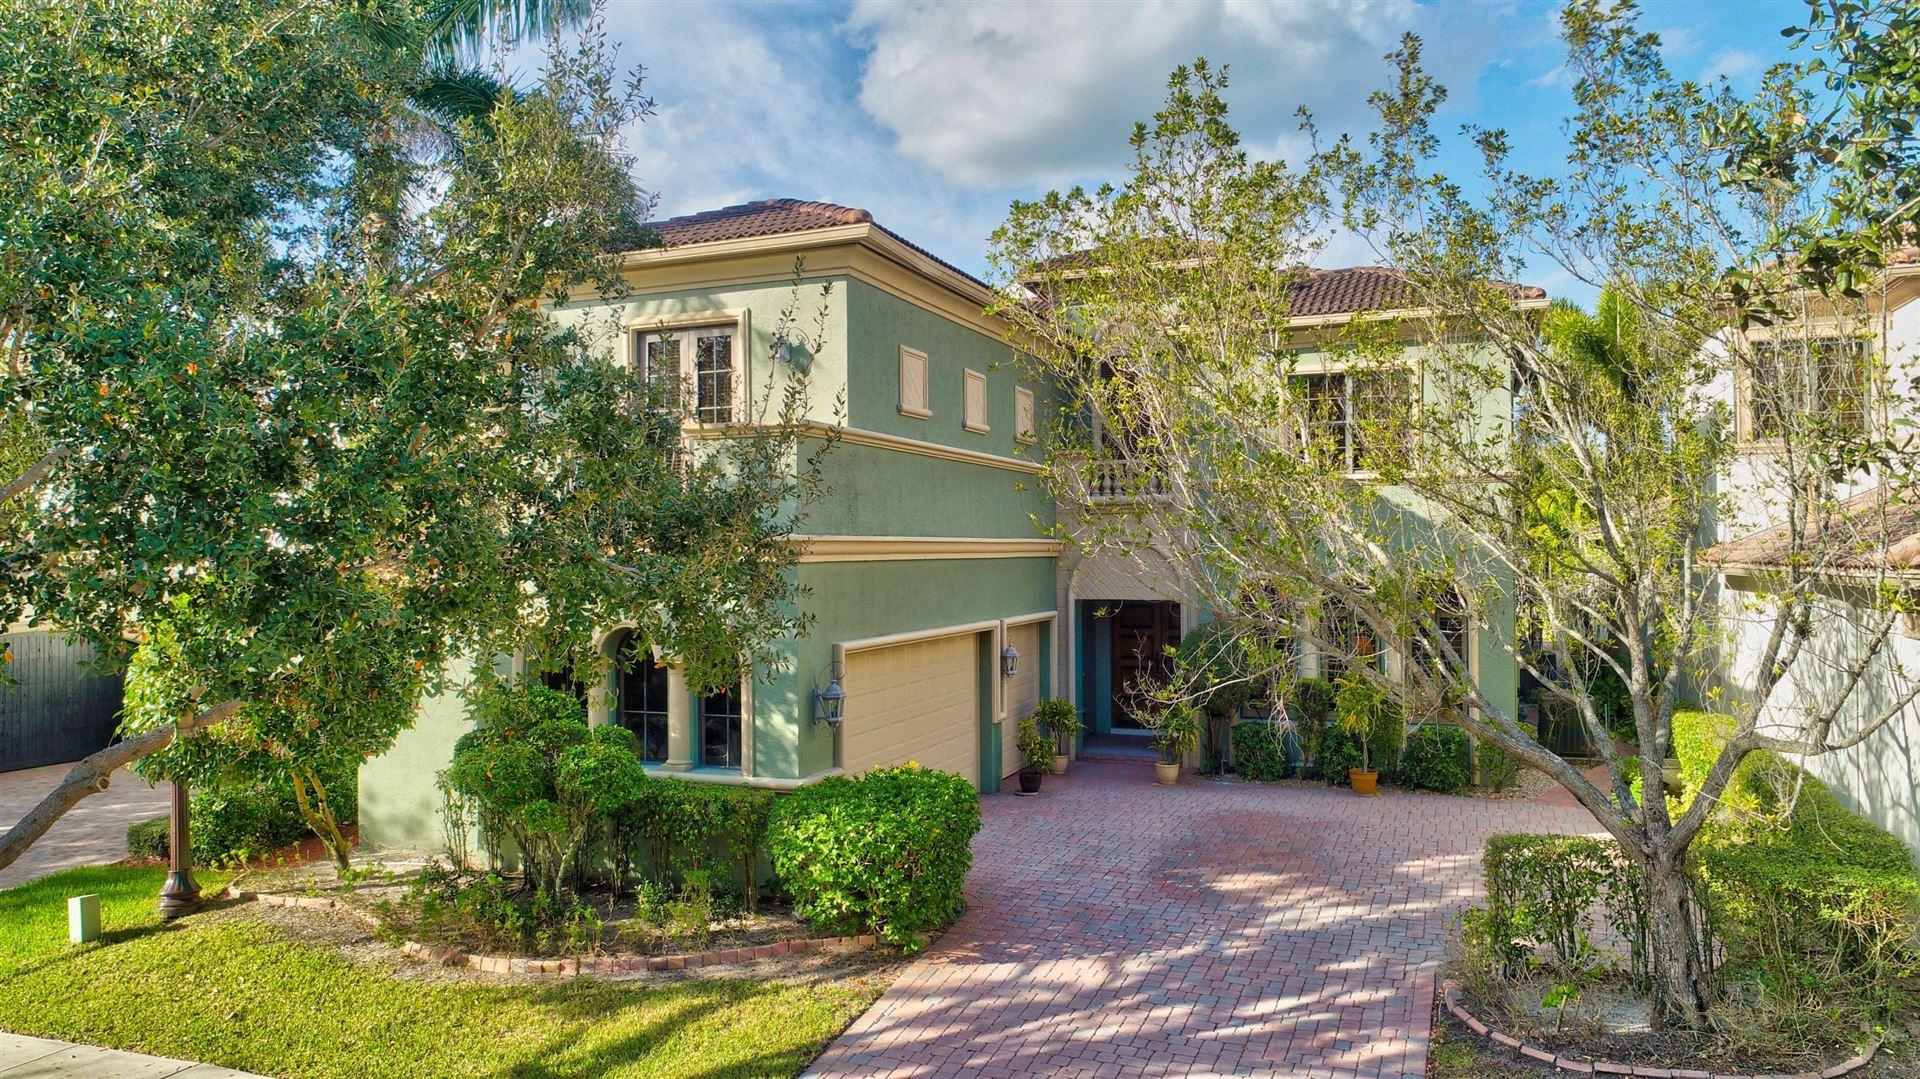 Photo of 17848 Villa Club Way, Boca Raton, FL 33496 (MLS # RX-10597284)